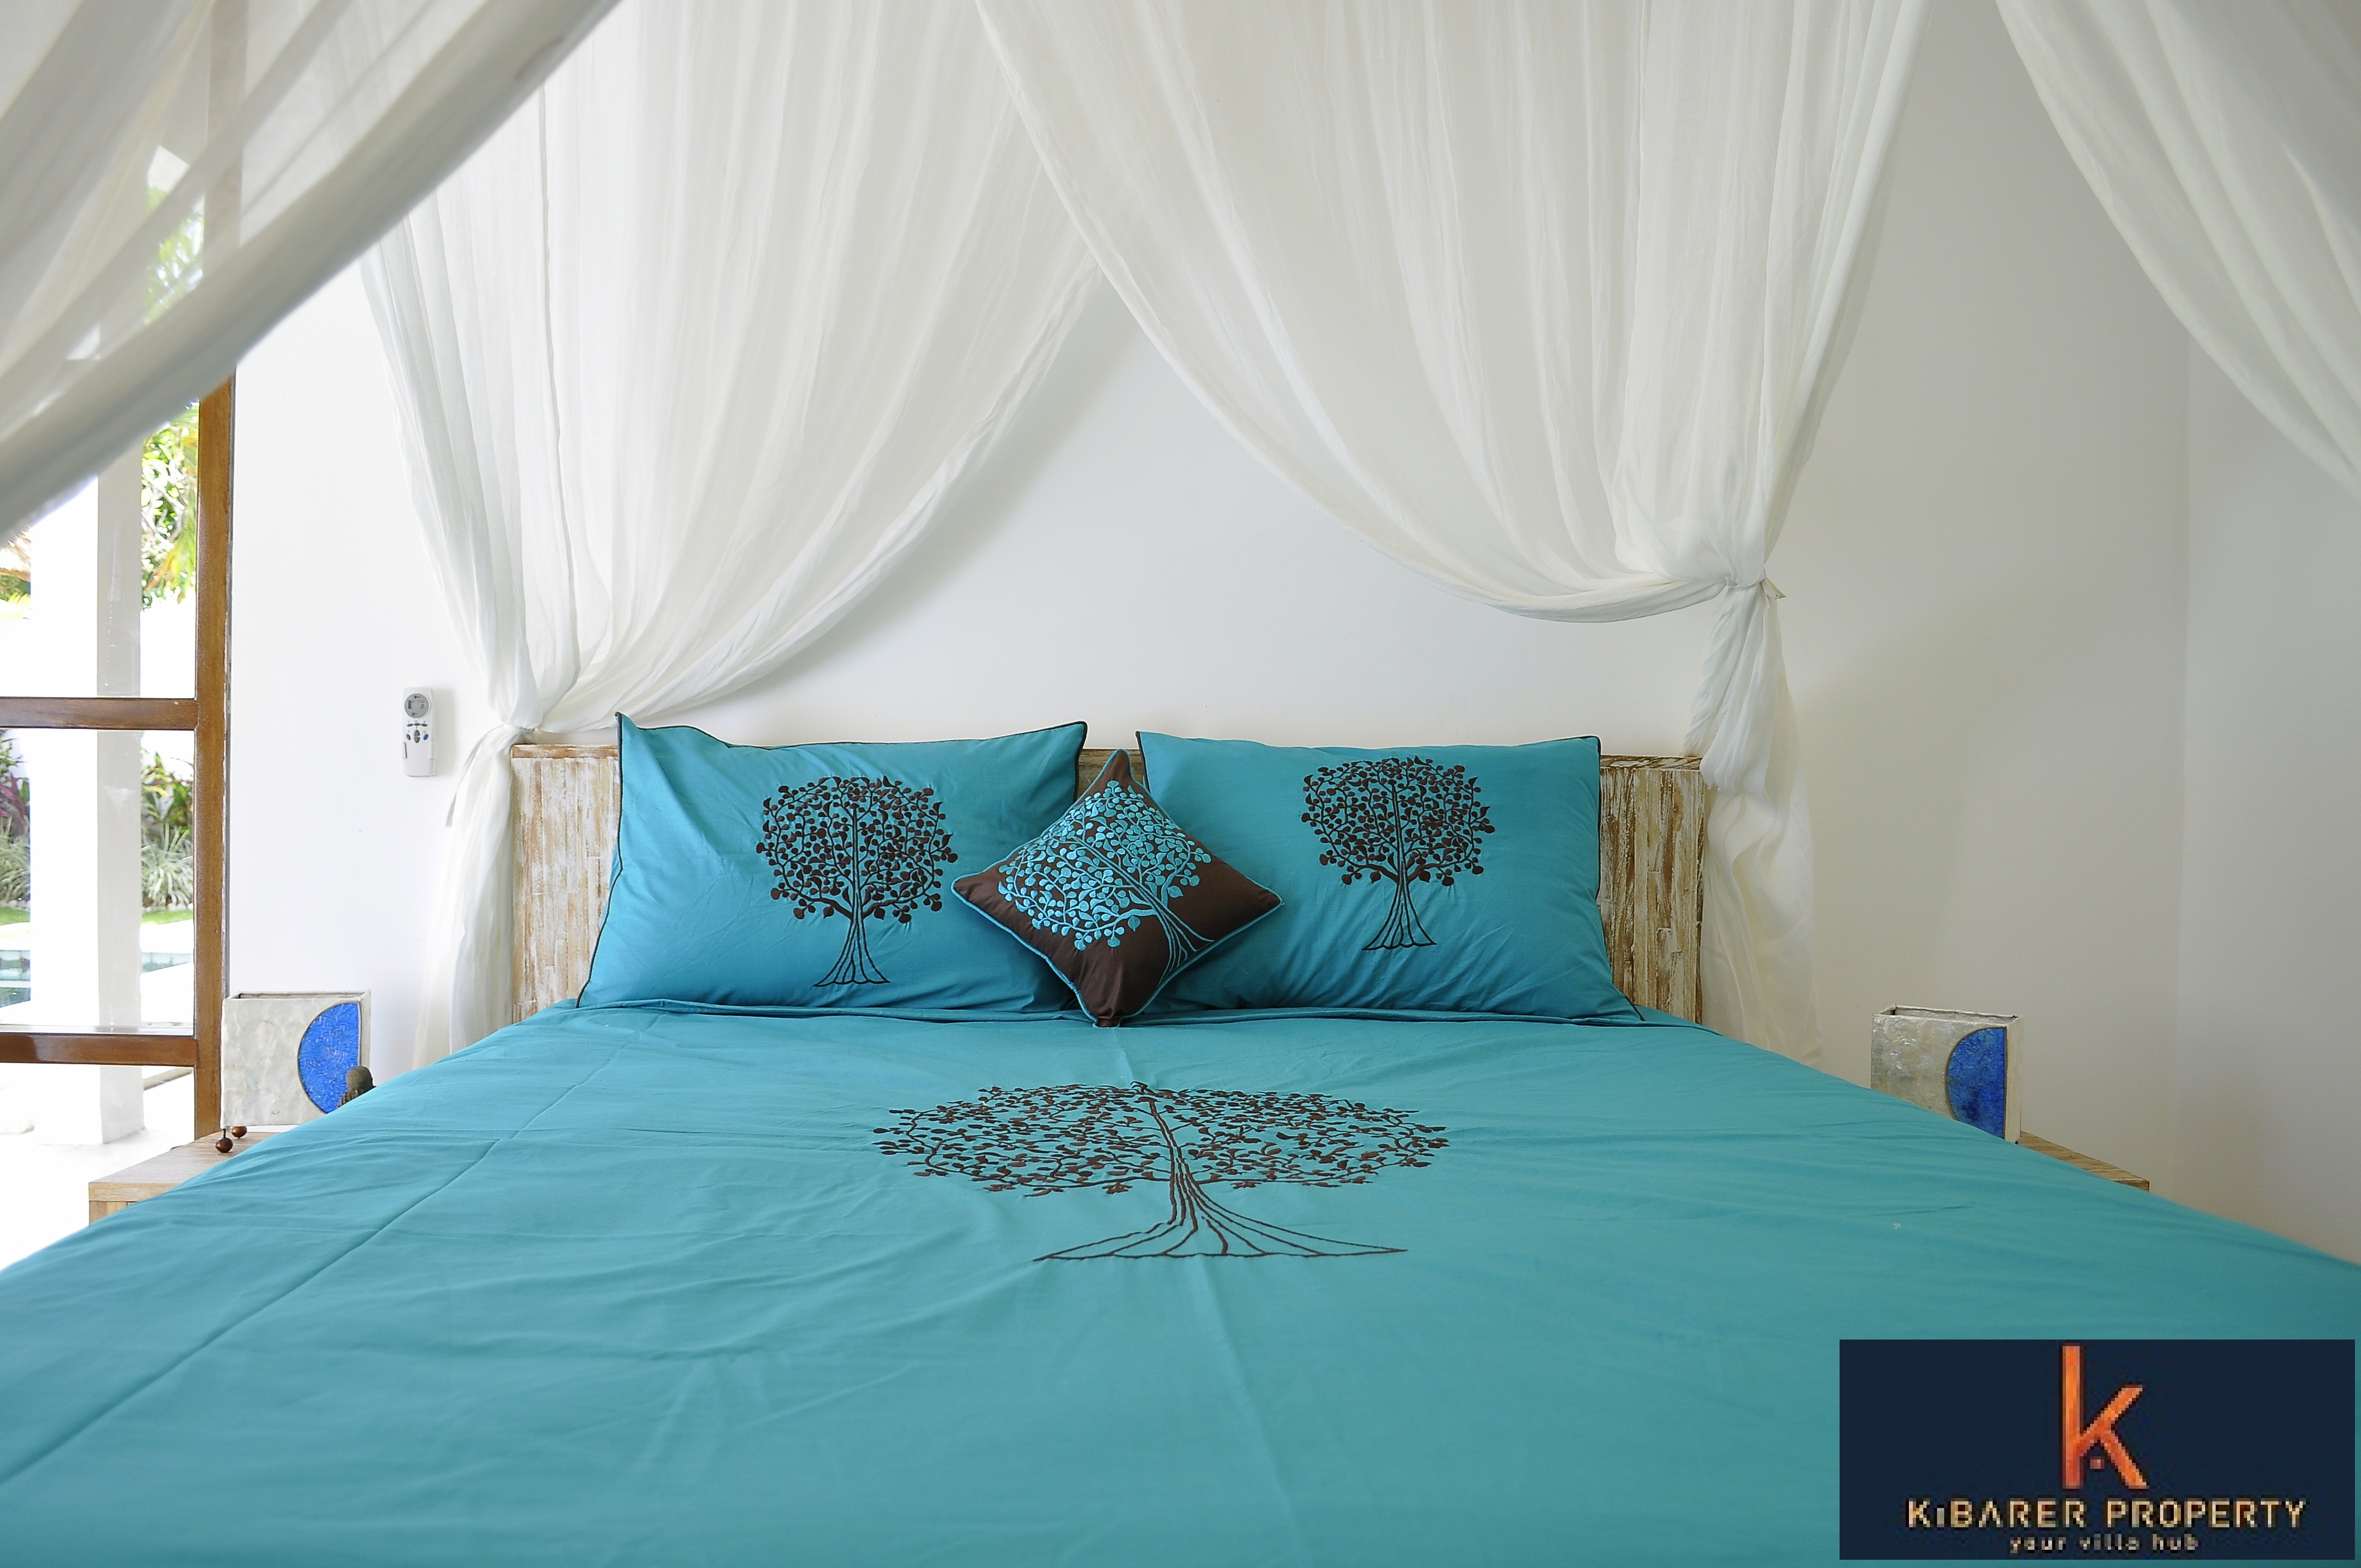 Lovely 2 bedrooms villa in Balangan, Bukit